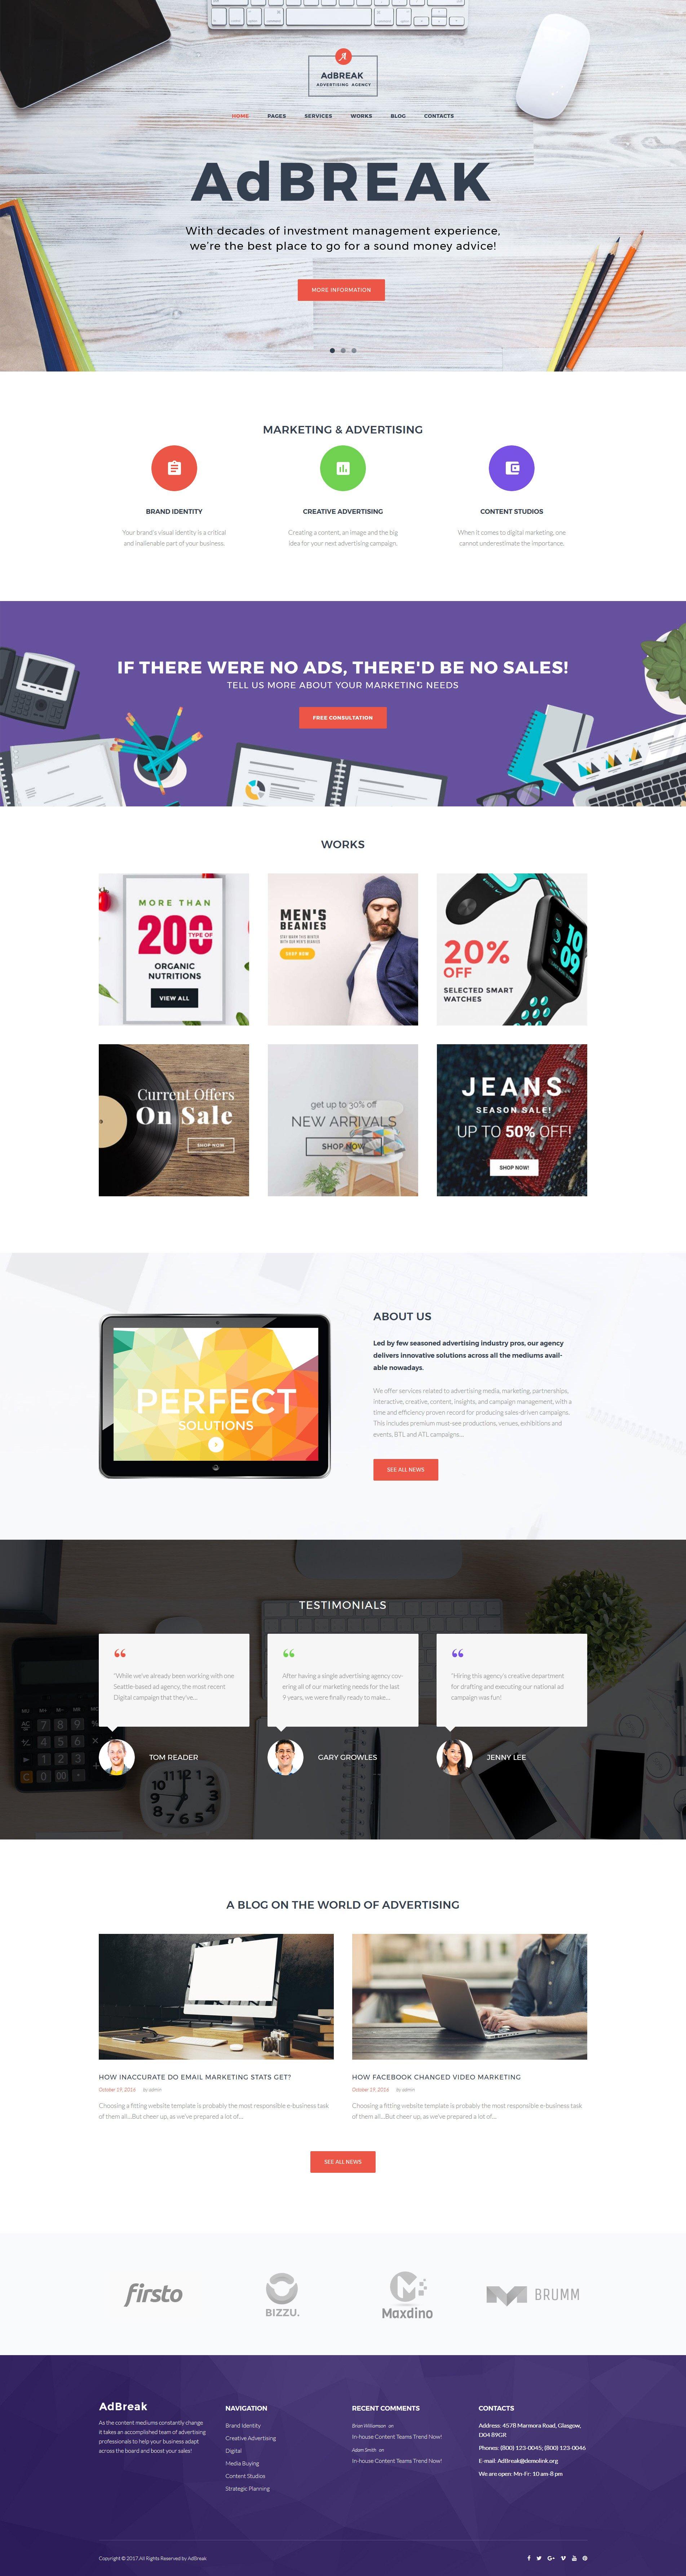 Responsivt AdBreak - Advertising Company WordPress-tema #63502 - skärmbild